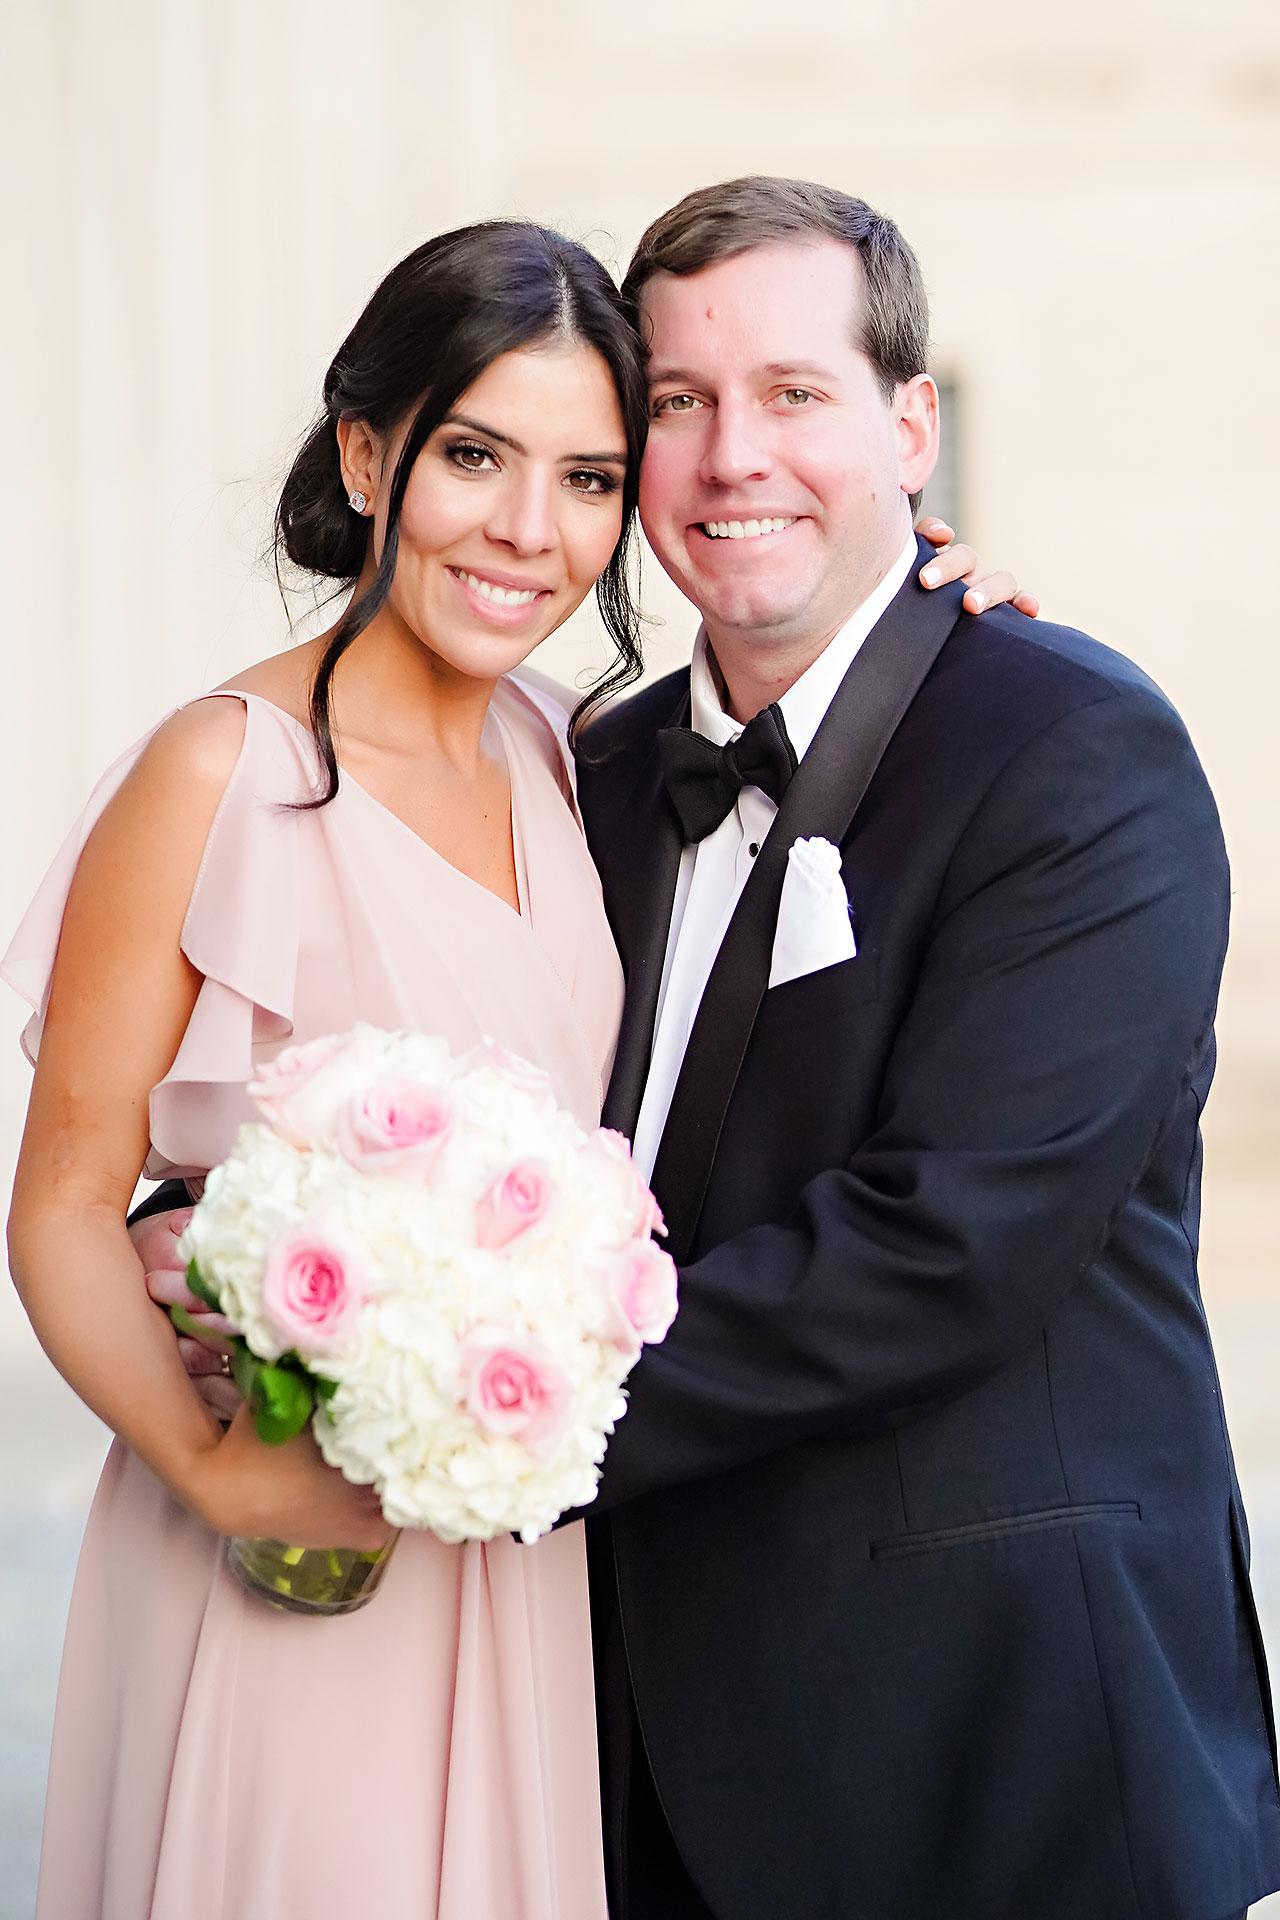 Erin Grant Indianapolis Central Library Scottish Rite Wedding 188